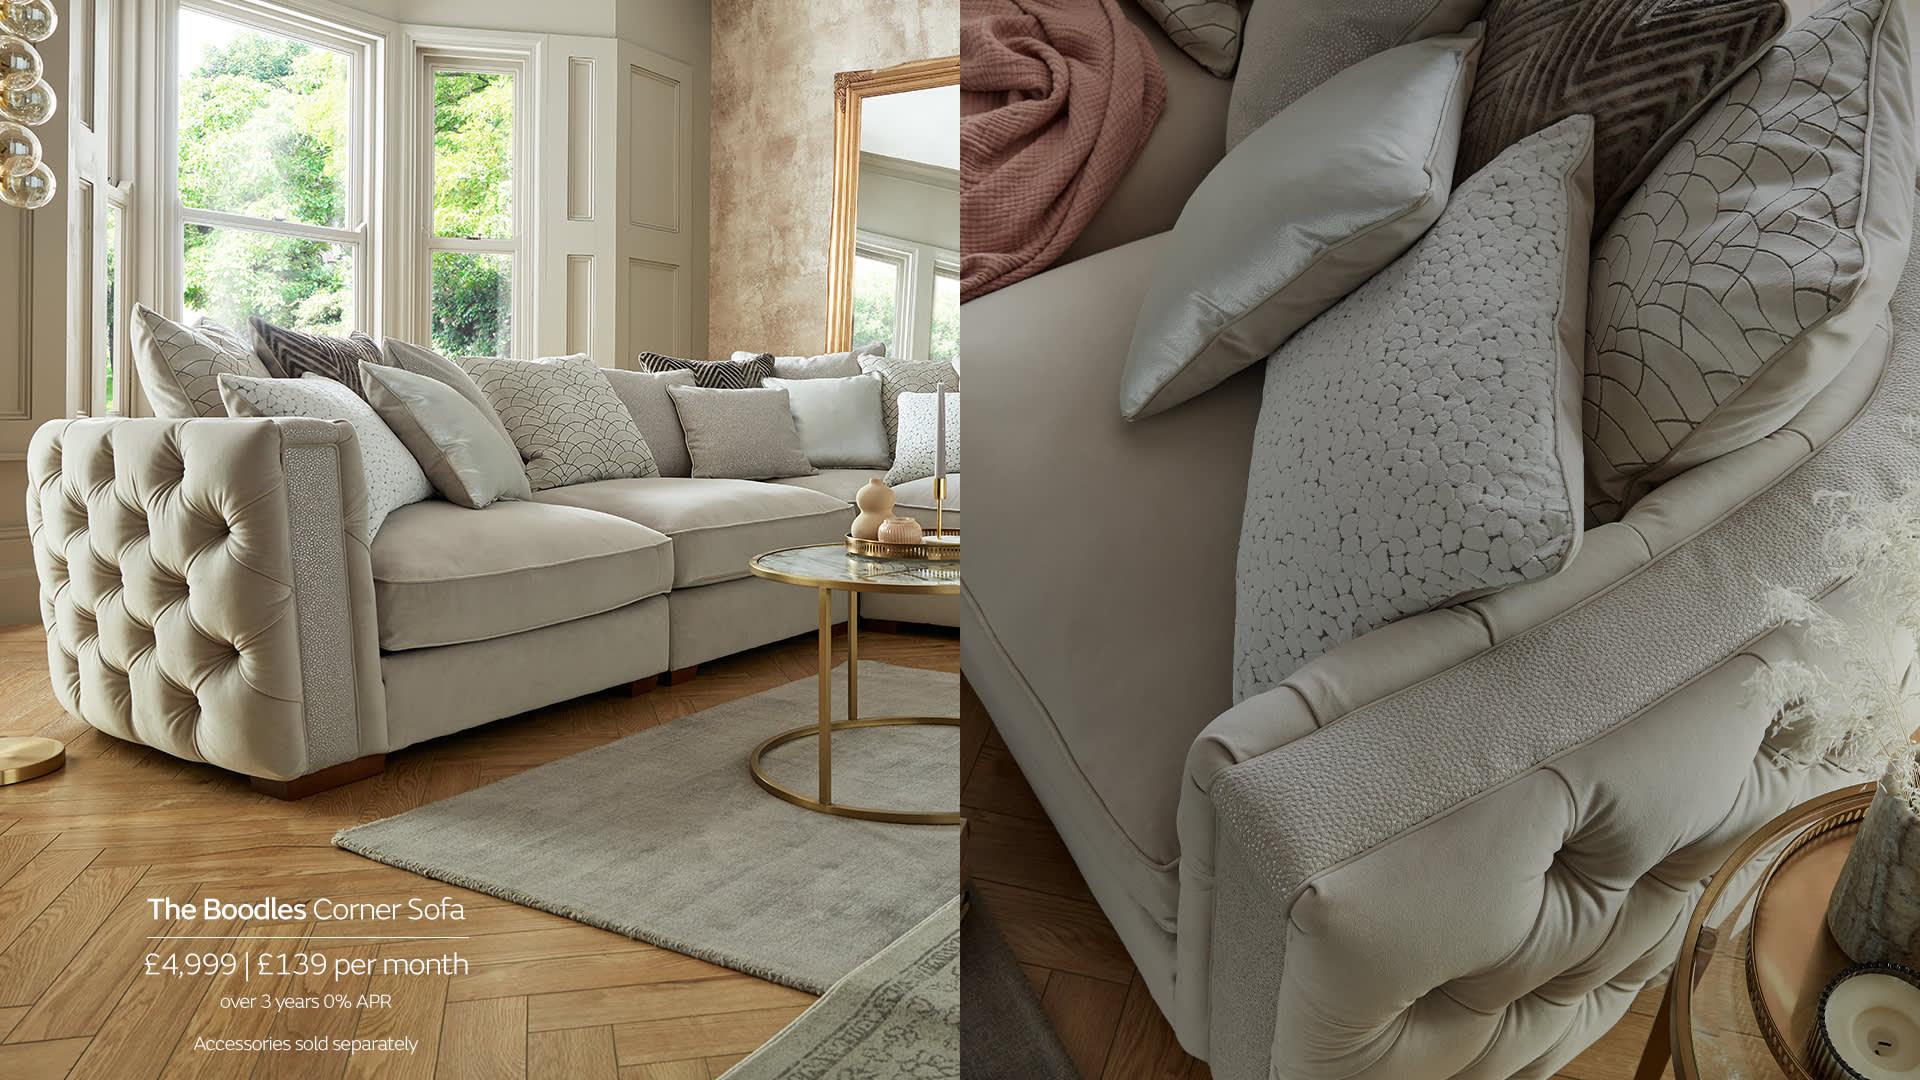 Sofology Boodles Sofa